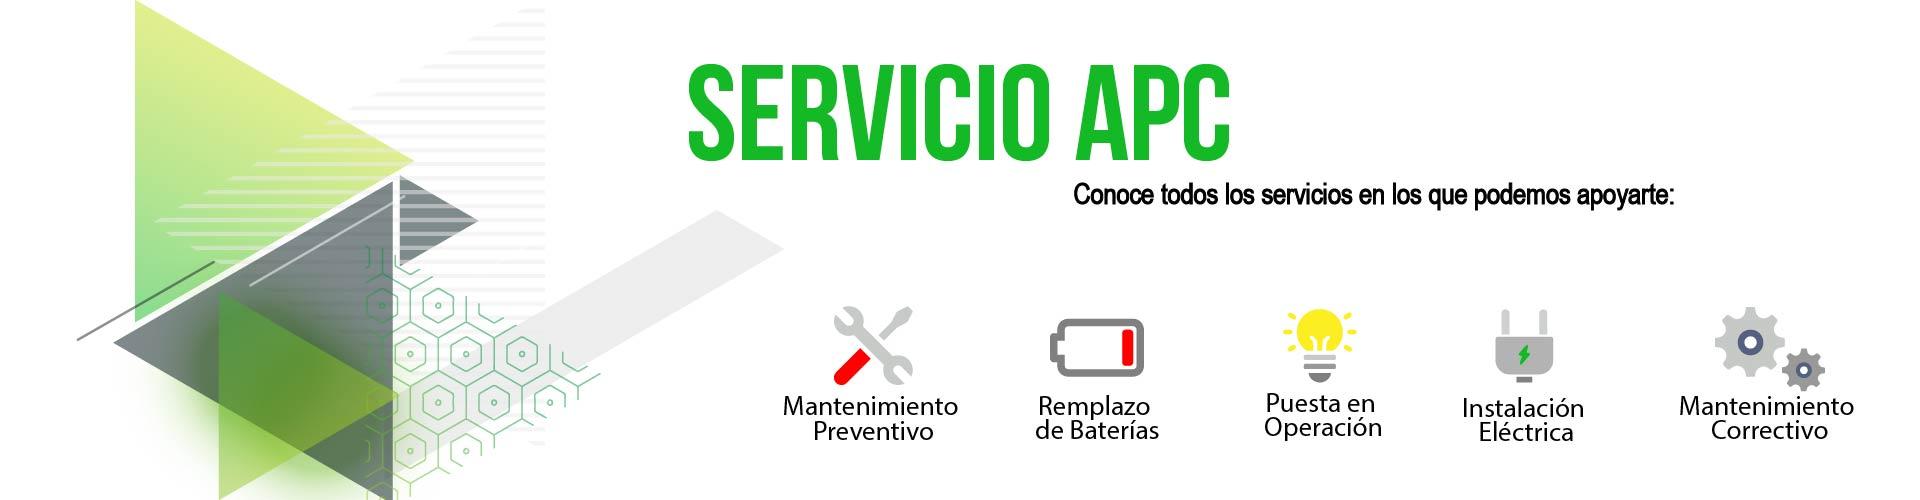 servicio apc mexico